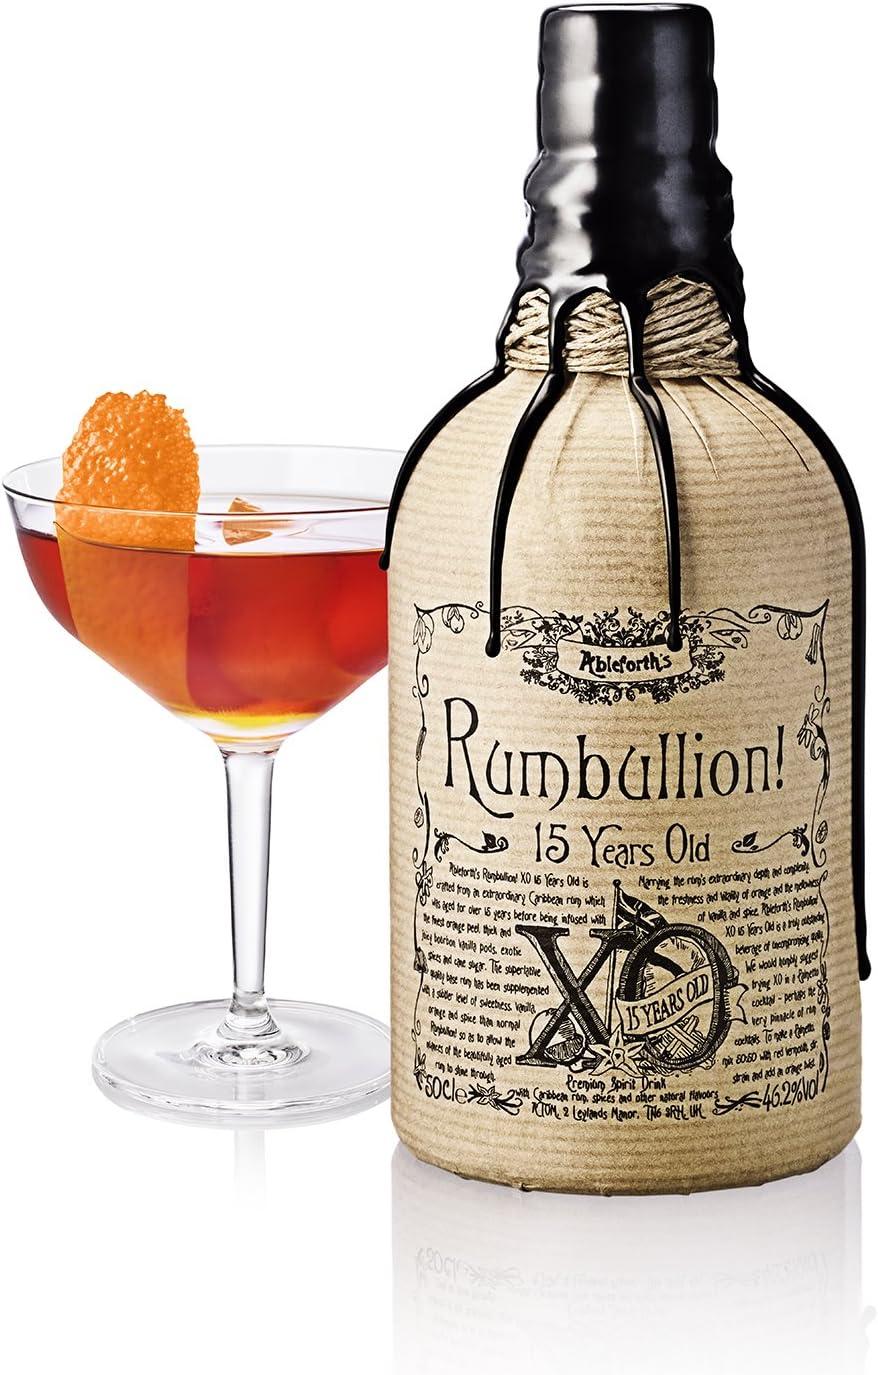 Ableforths Rumbullion! XO 15 Years Old Premium Spirit Drink ...